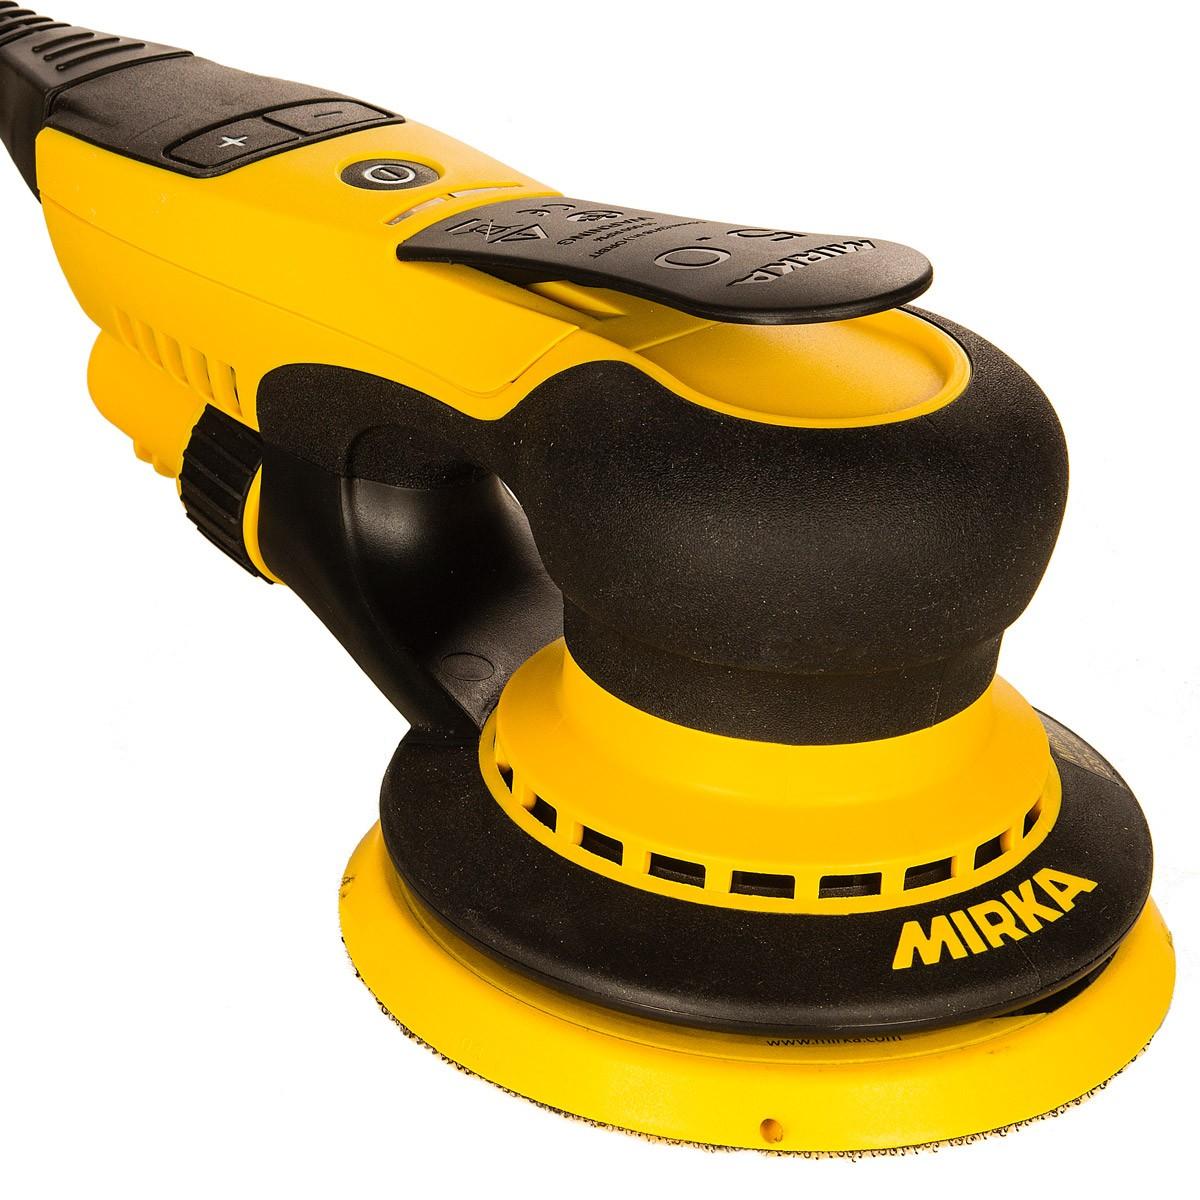 Mirka DEROS 5 Electric Sander MID55020CAUS Mirka